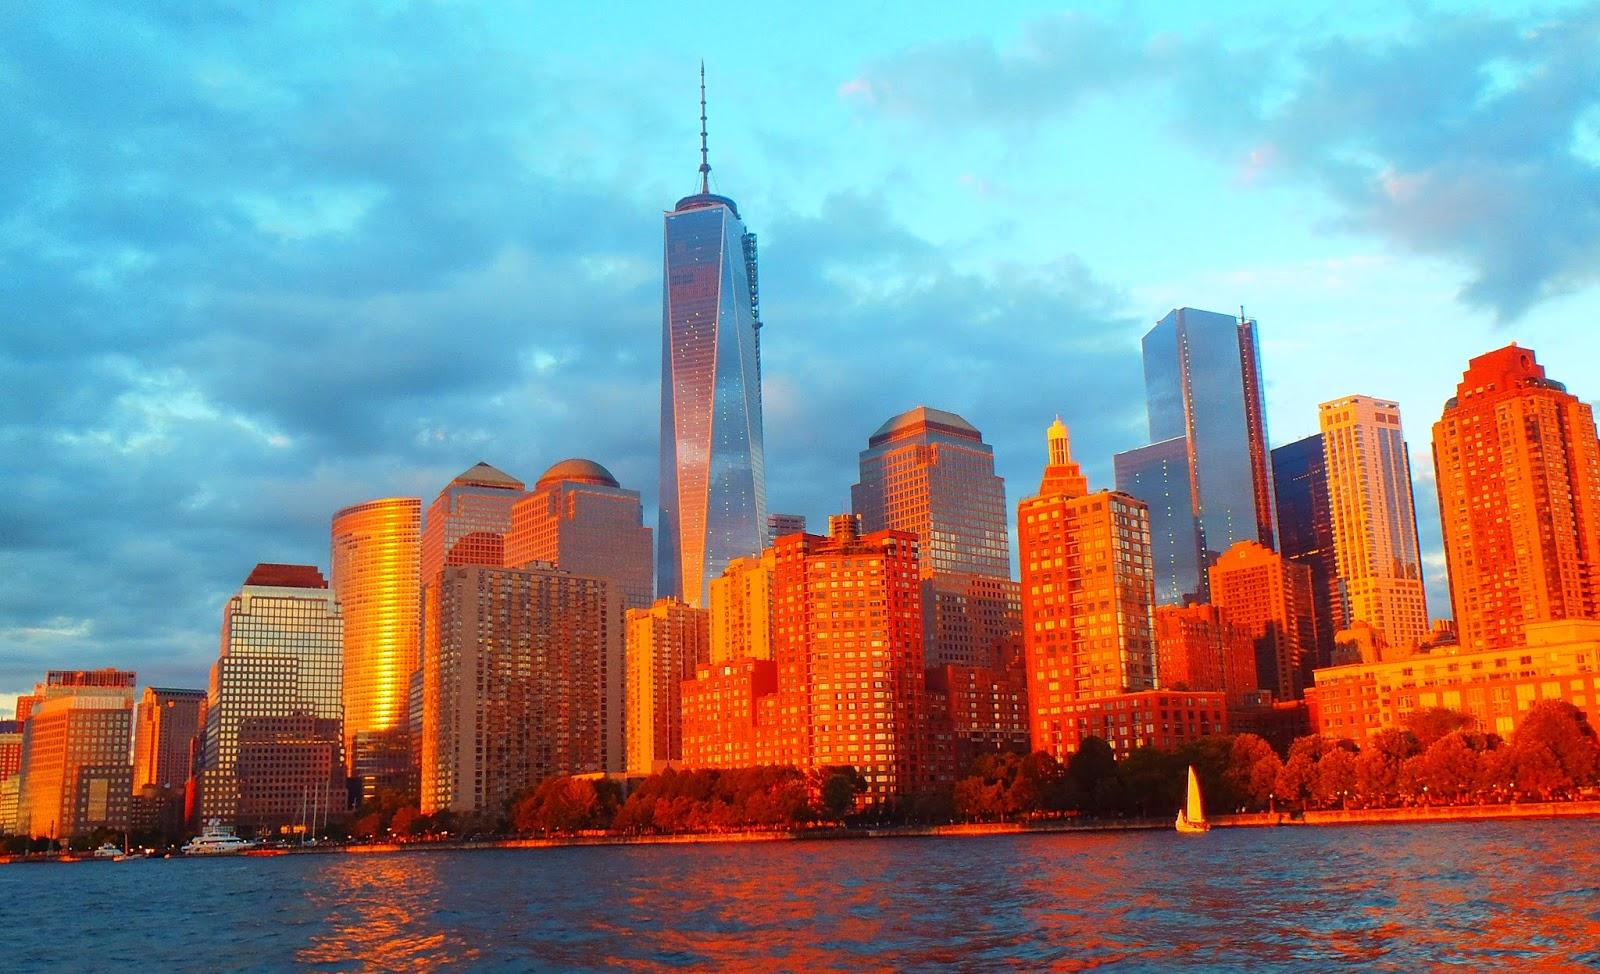 The sun setting on New York city skyline